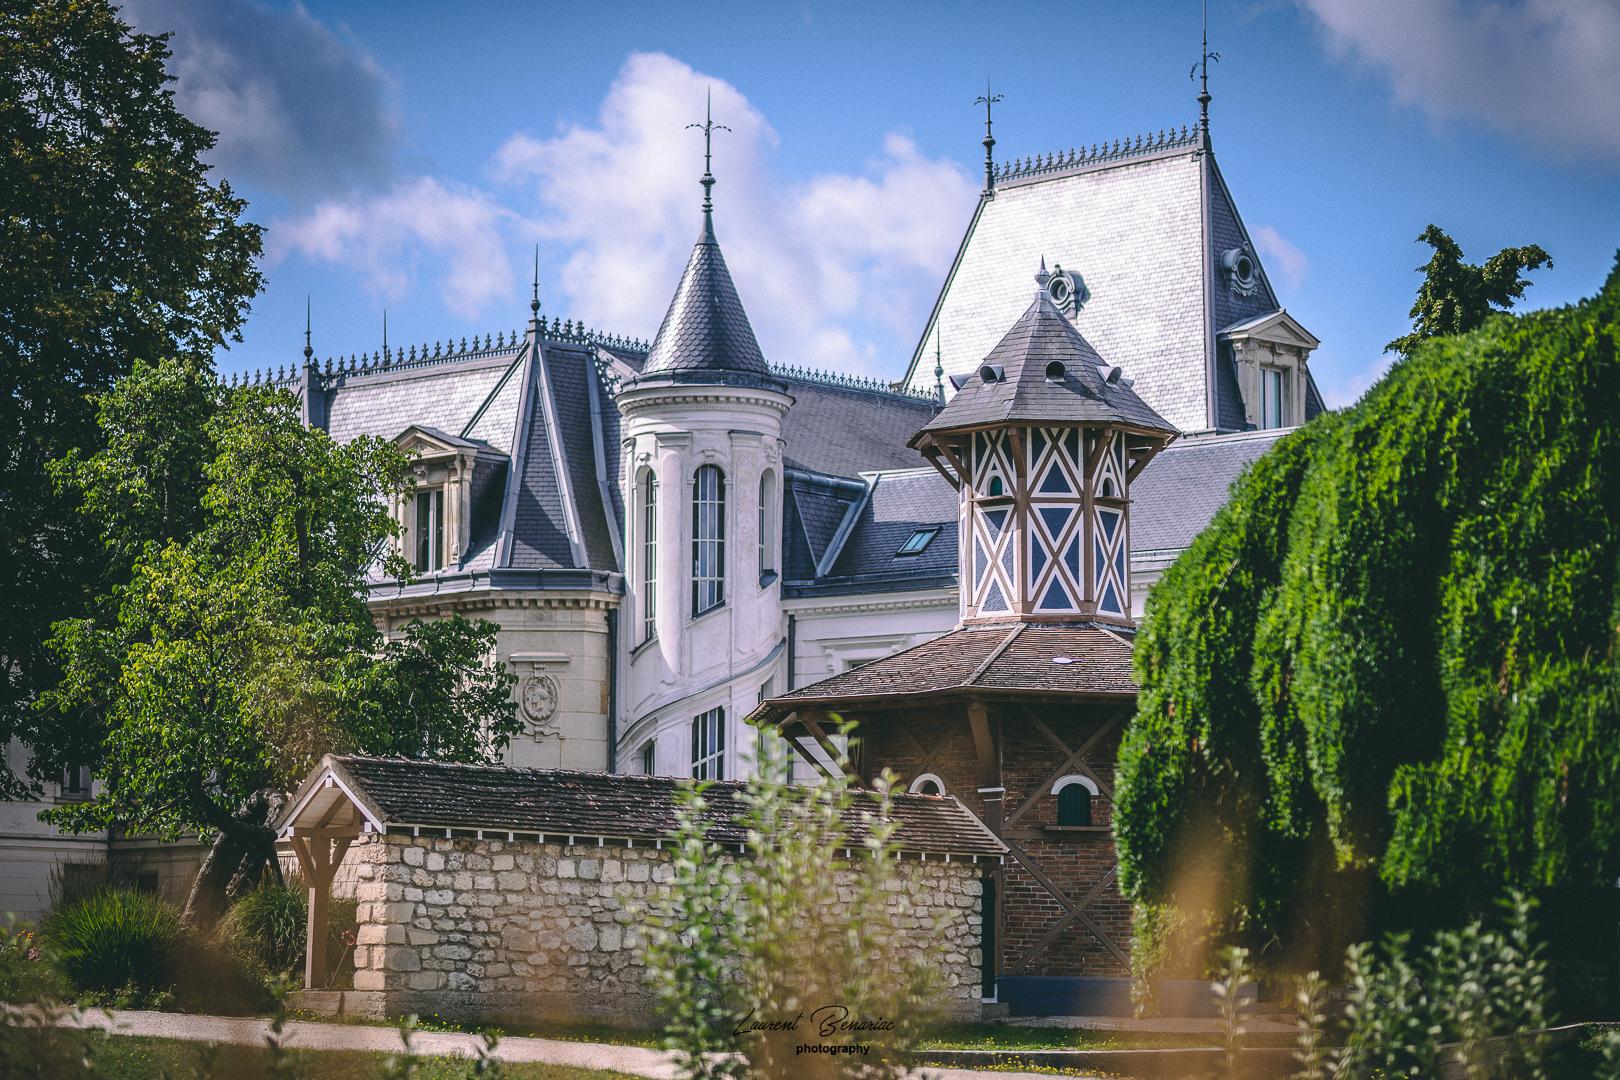 Conflans-Saint-Honorine